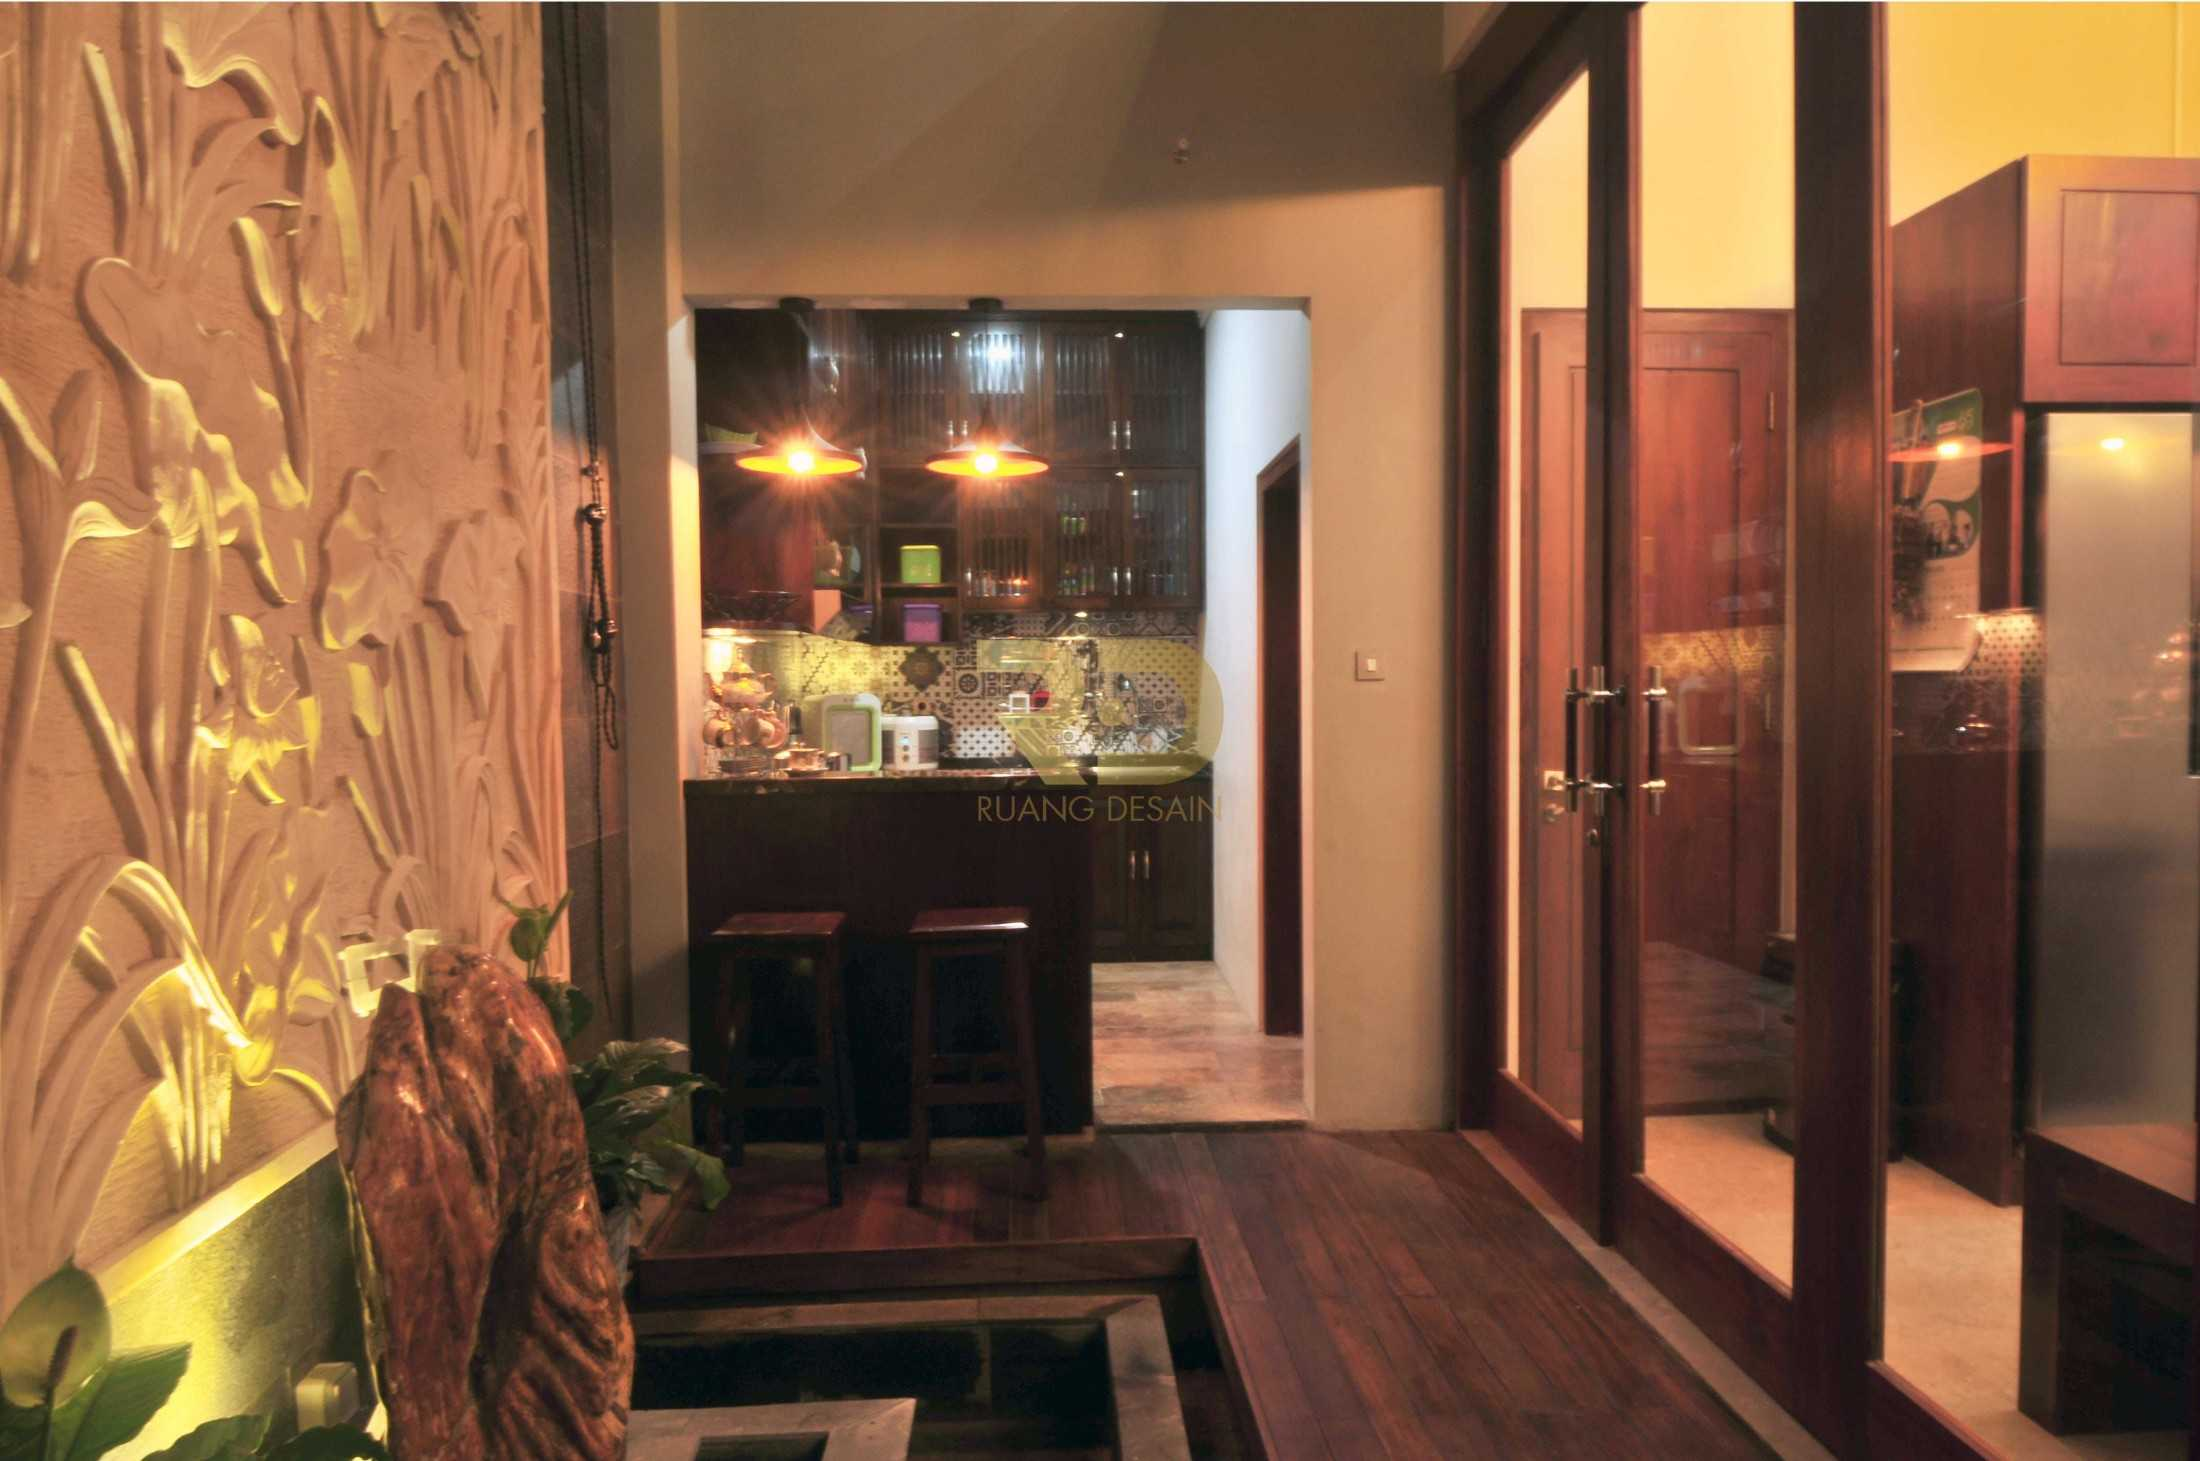 Ruang Desain Solid Wood Kitchen Surabaya, Kota Sby, Jawa Timur, Indonesia Surabaya, Kota Sby, Jawa Timur, Indonesia Ruang-Desain-Solid-Wood-Kitchen  93959